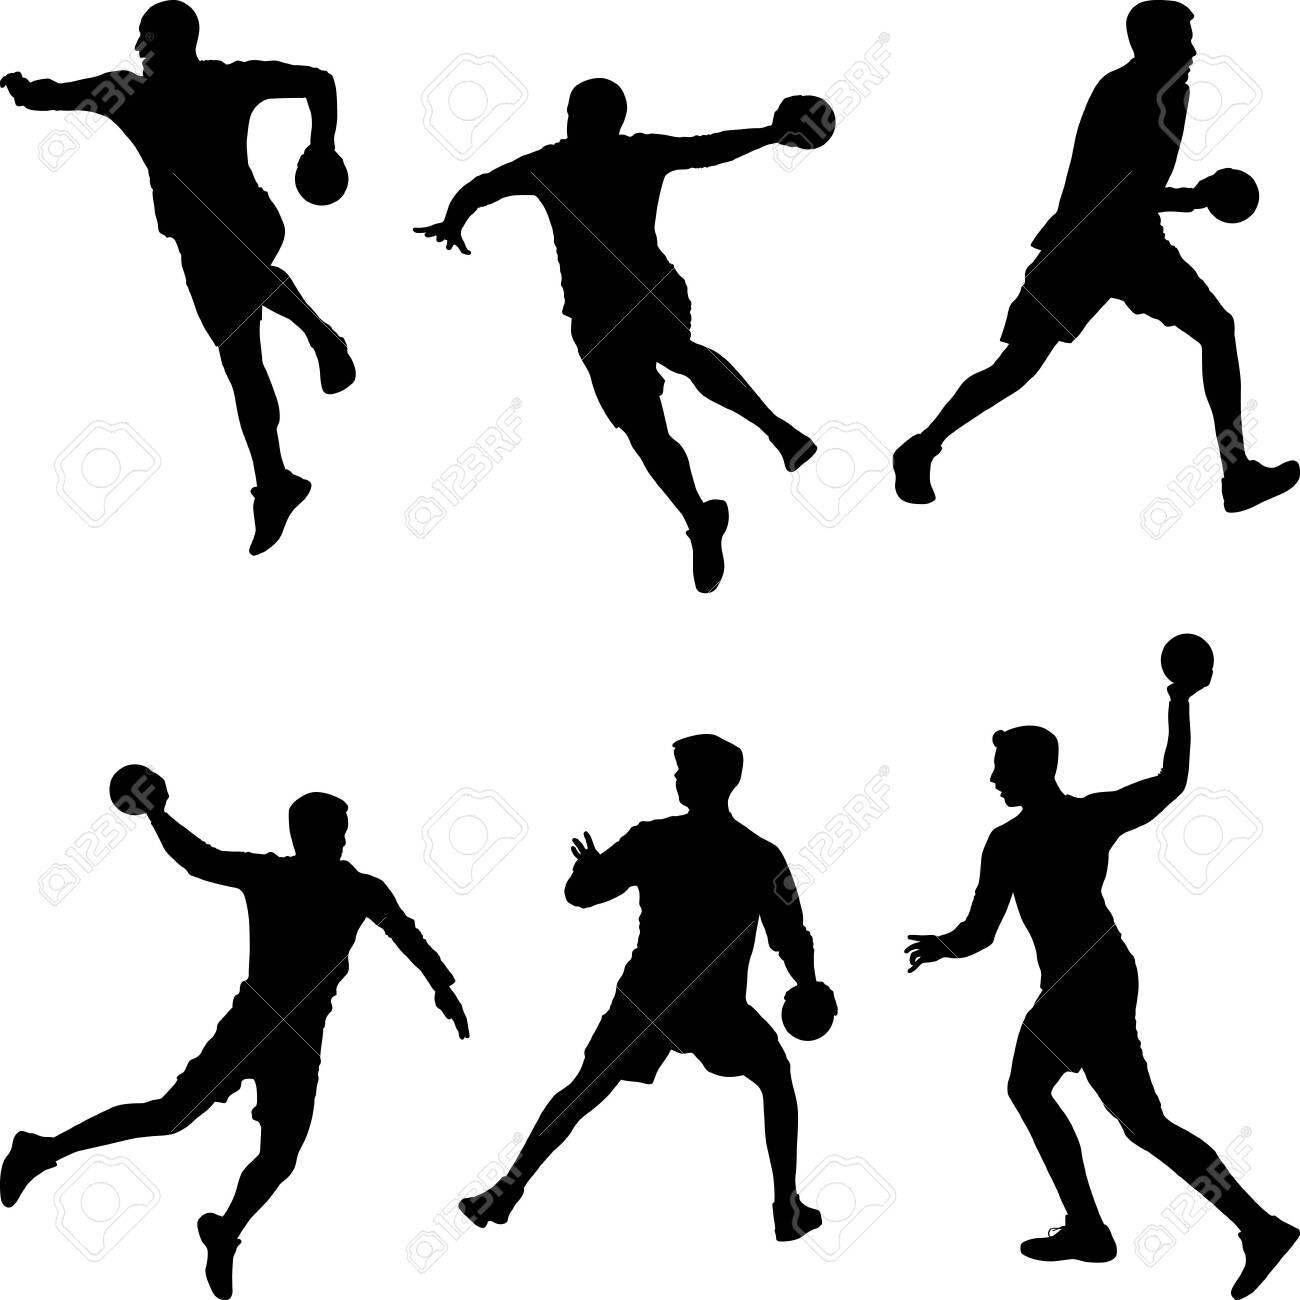 handball player throwing the ball set of silhouettes